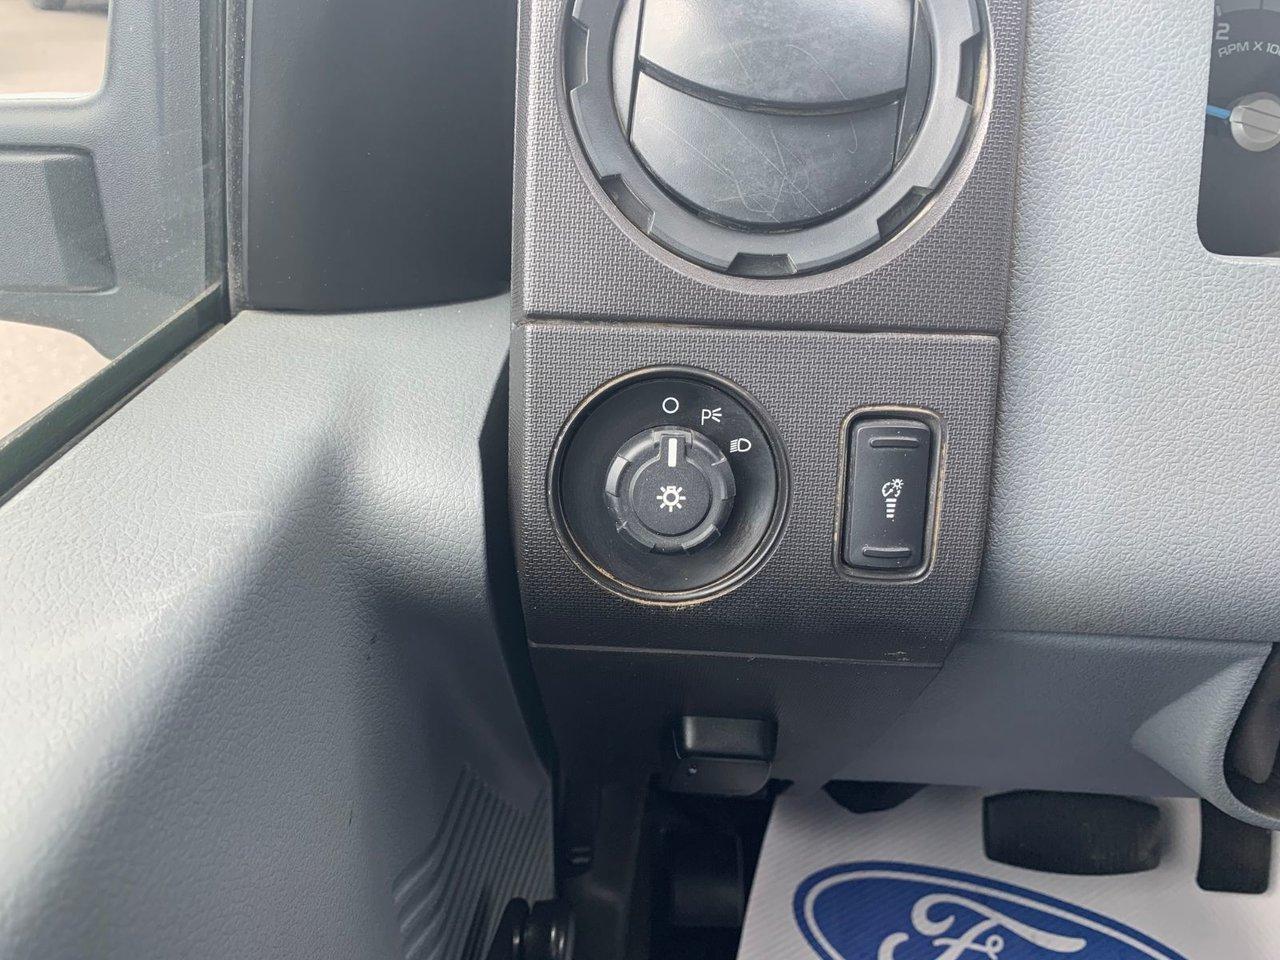 2013 Ford Super duty F-550 DRW CUBE XL 12 PIEDS